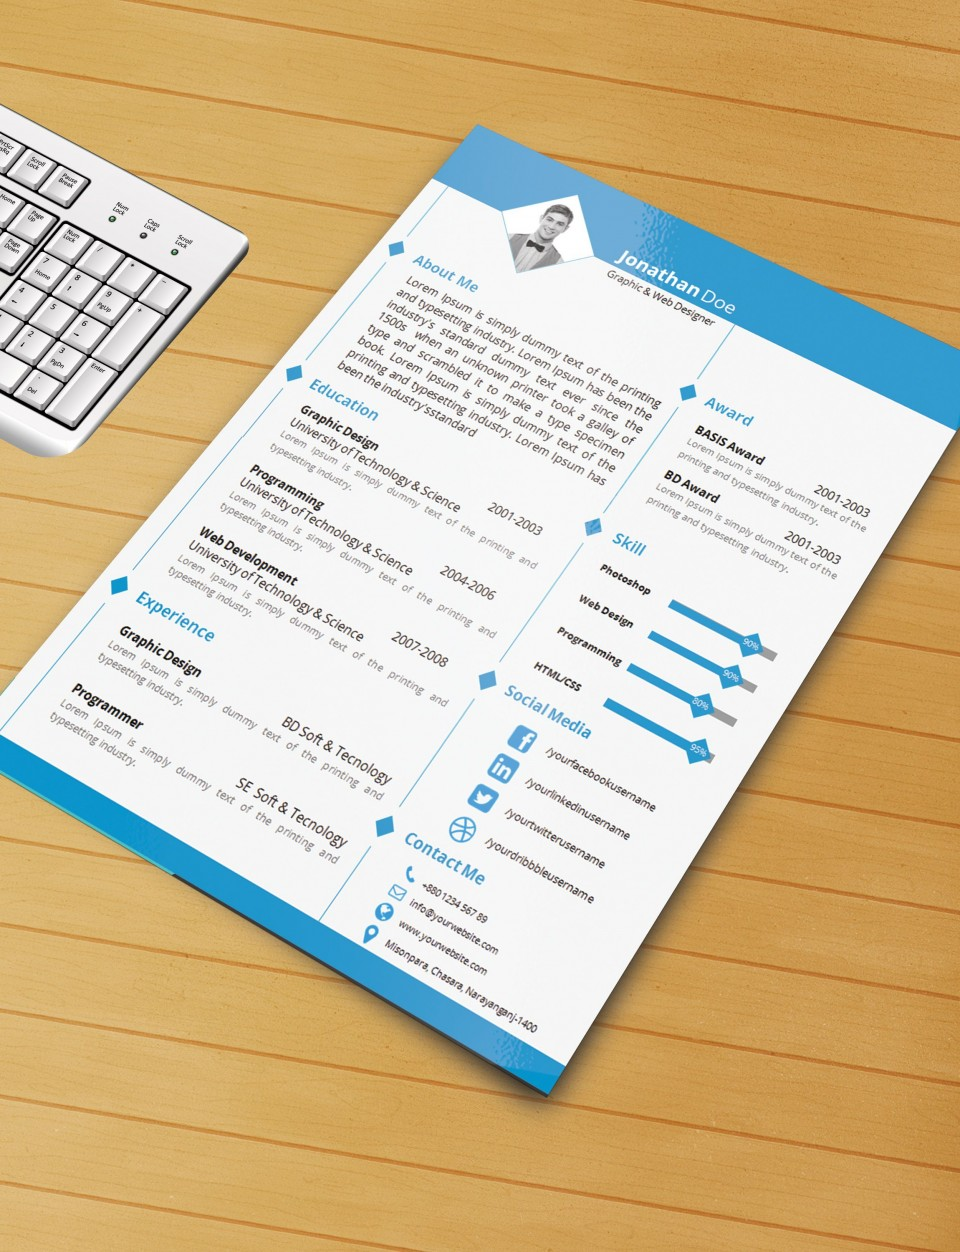 003 Imposing Microsoft Word Template Download Image  M Cv Free Header960